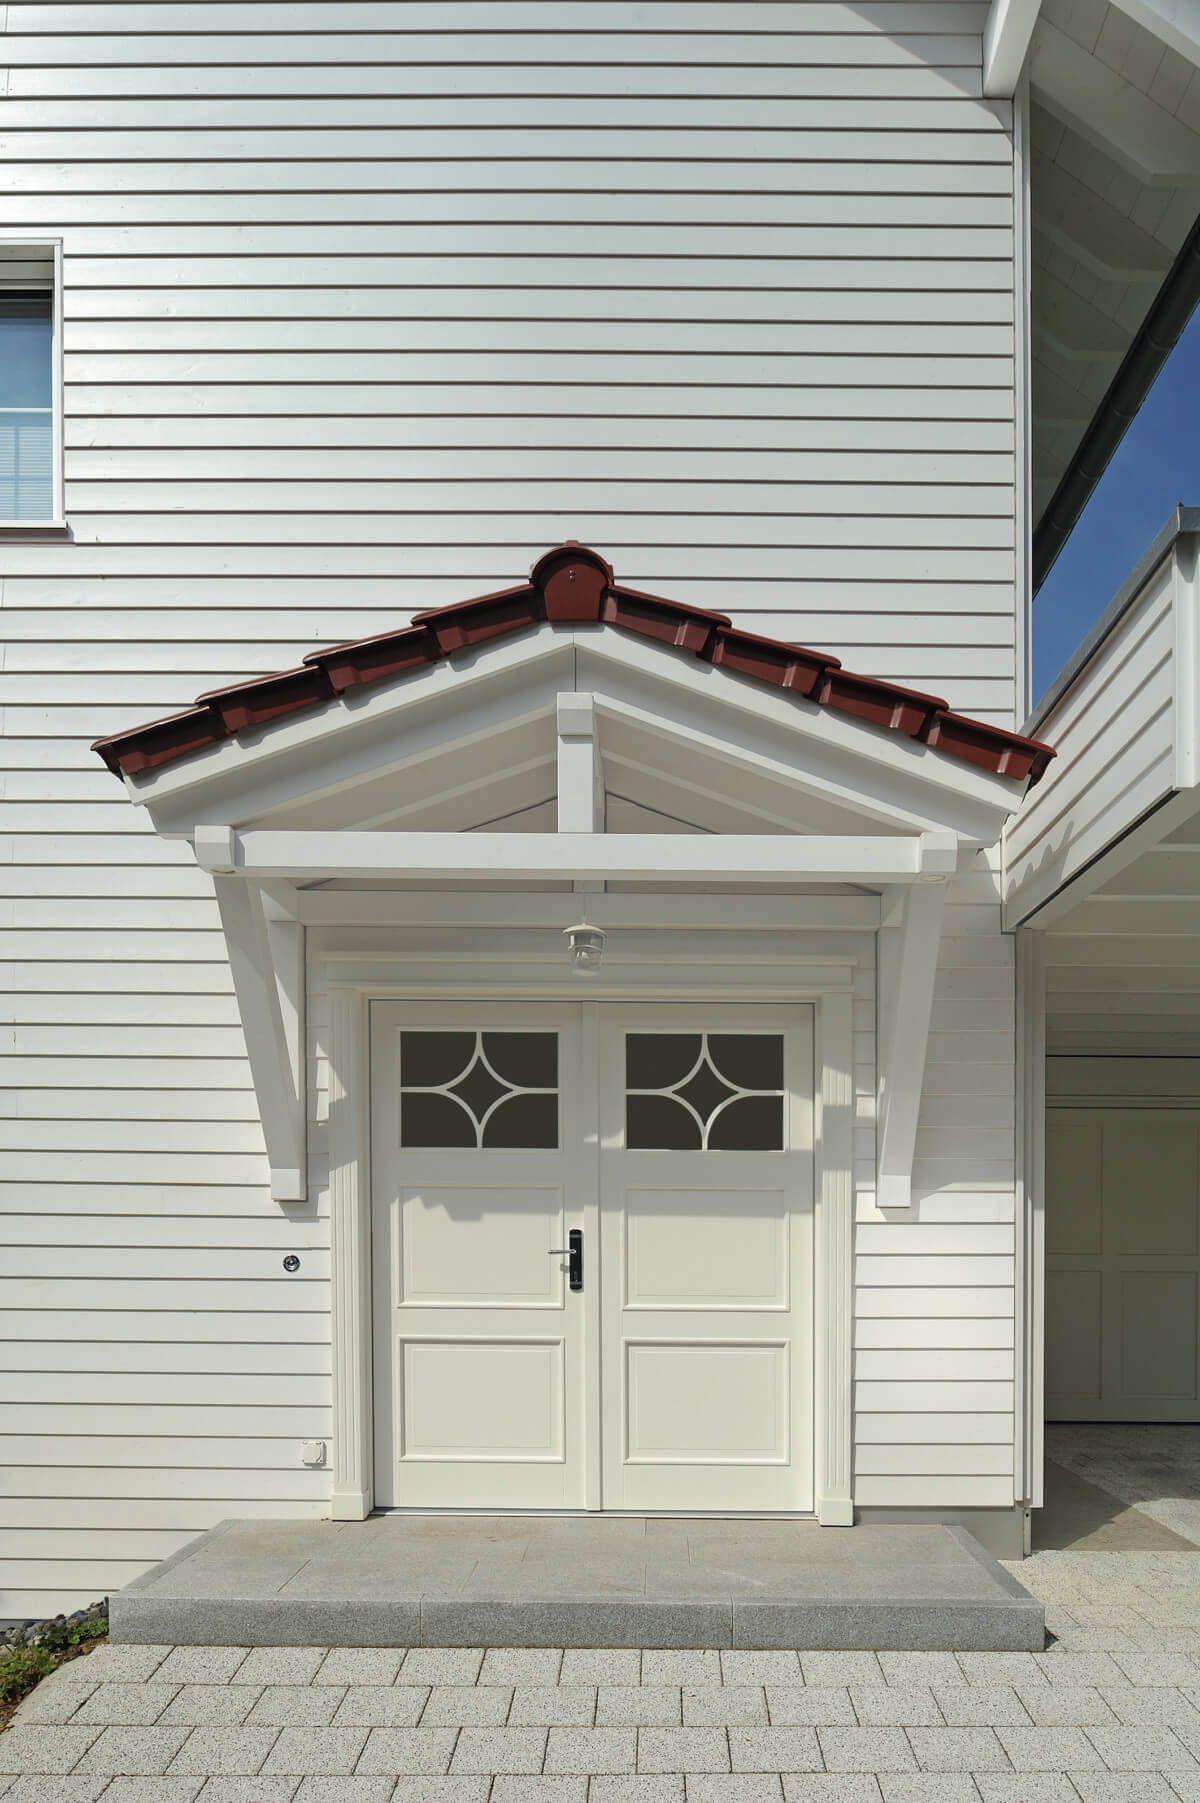 Amerikanisches Landhaus hauseingang überdacht im landhausstil - architektur detail